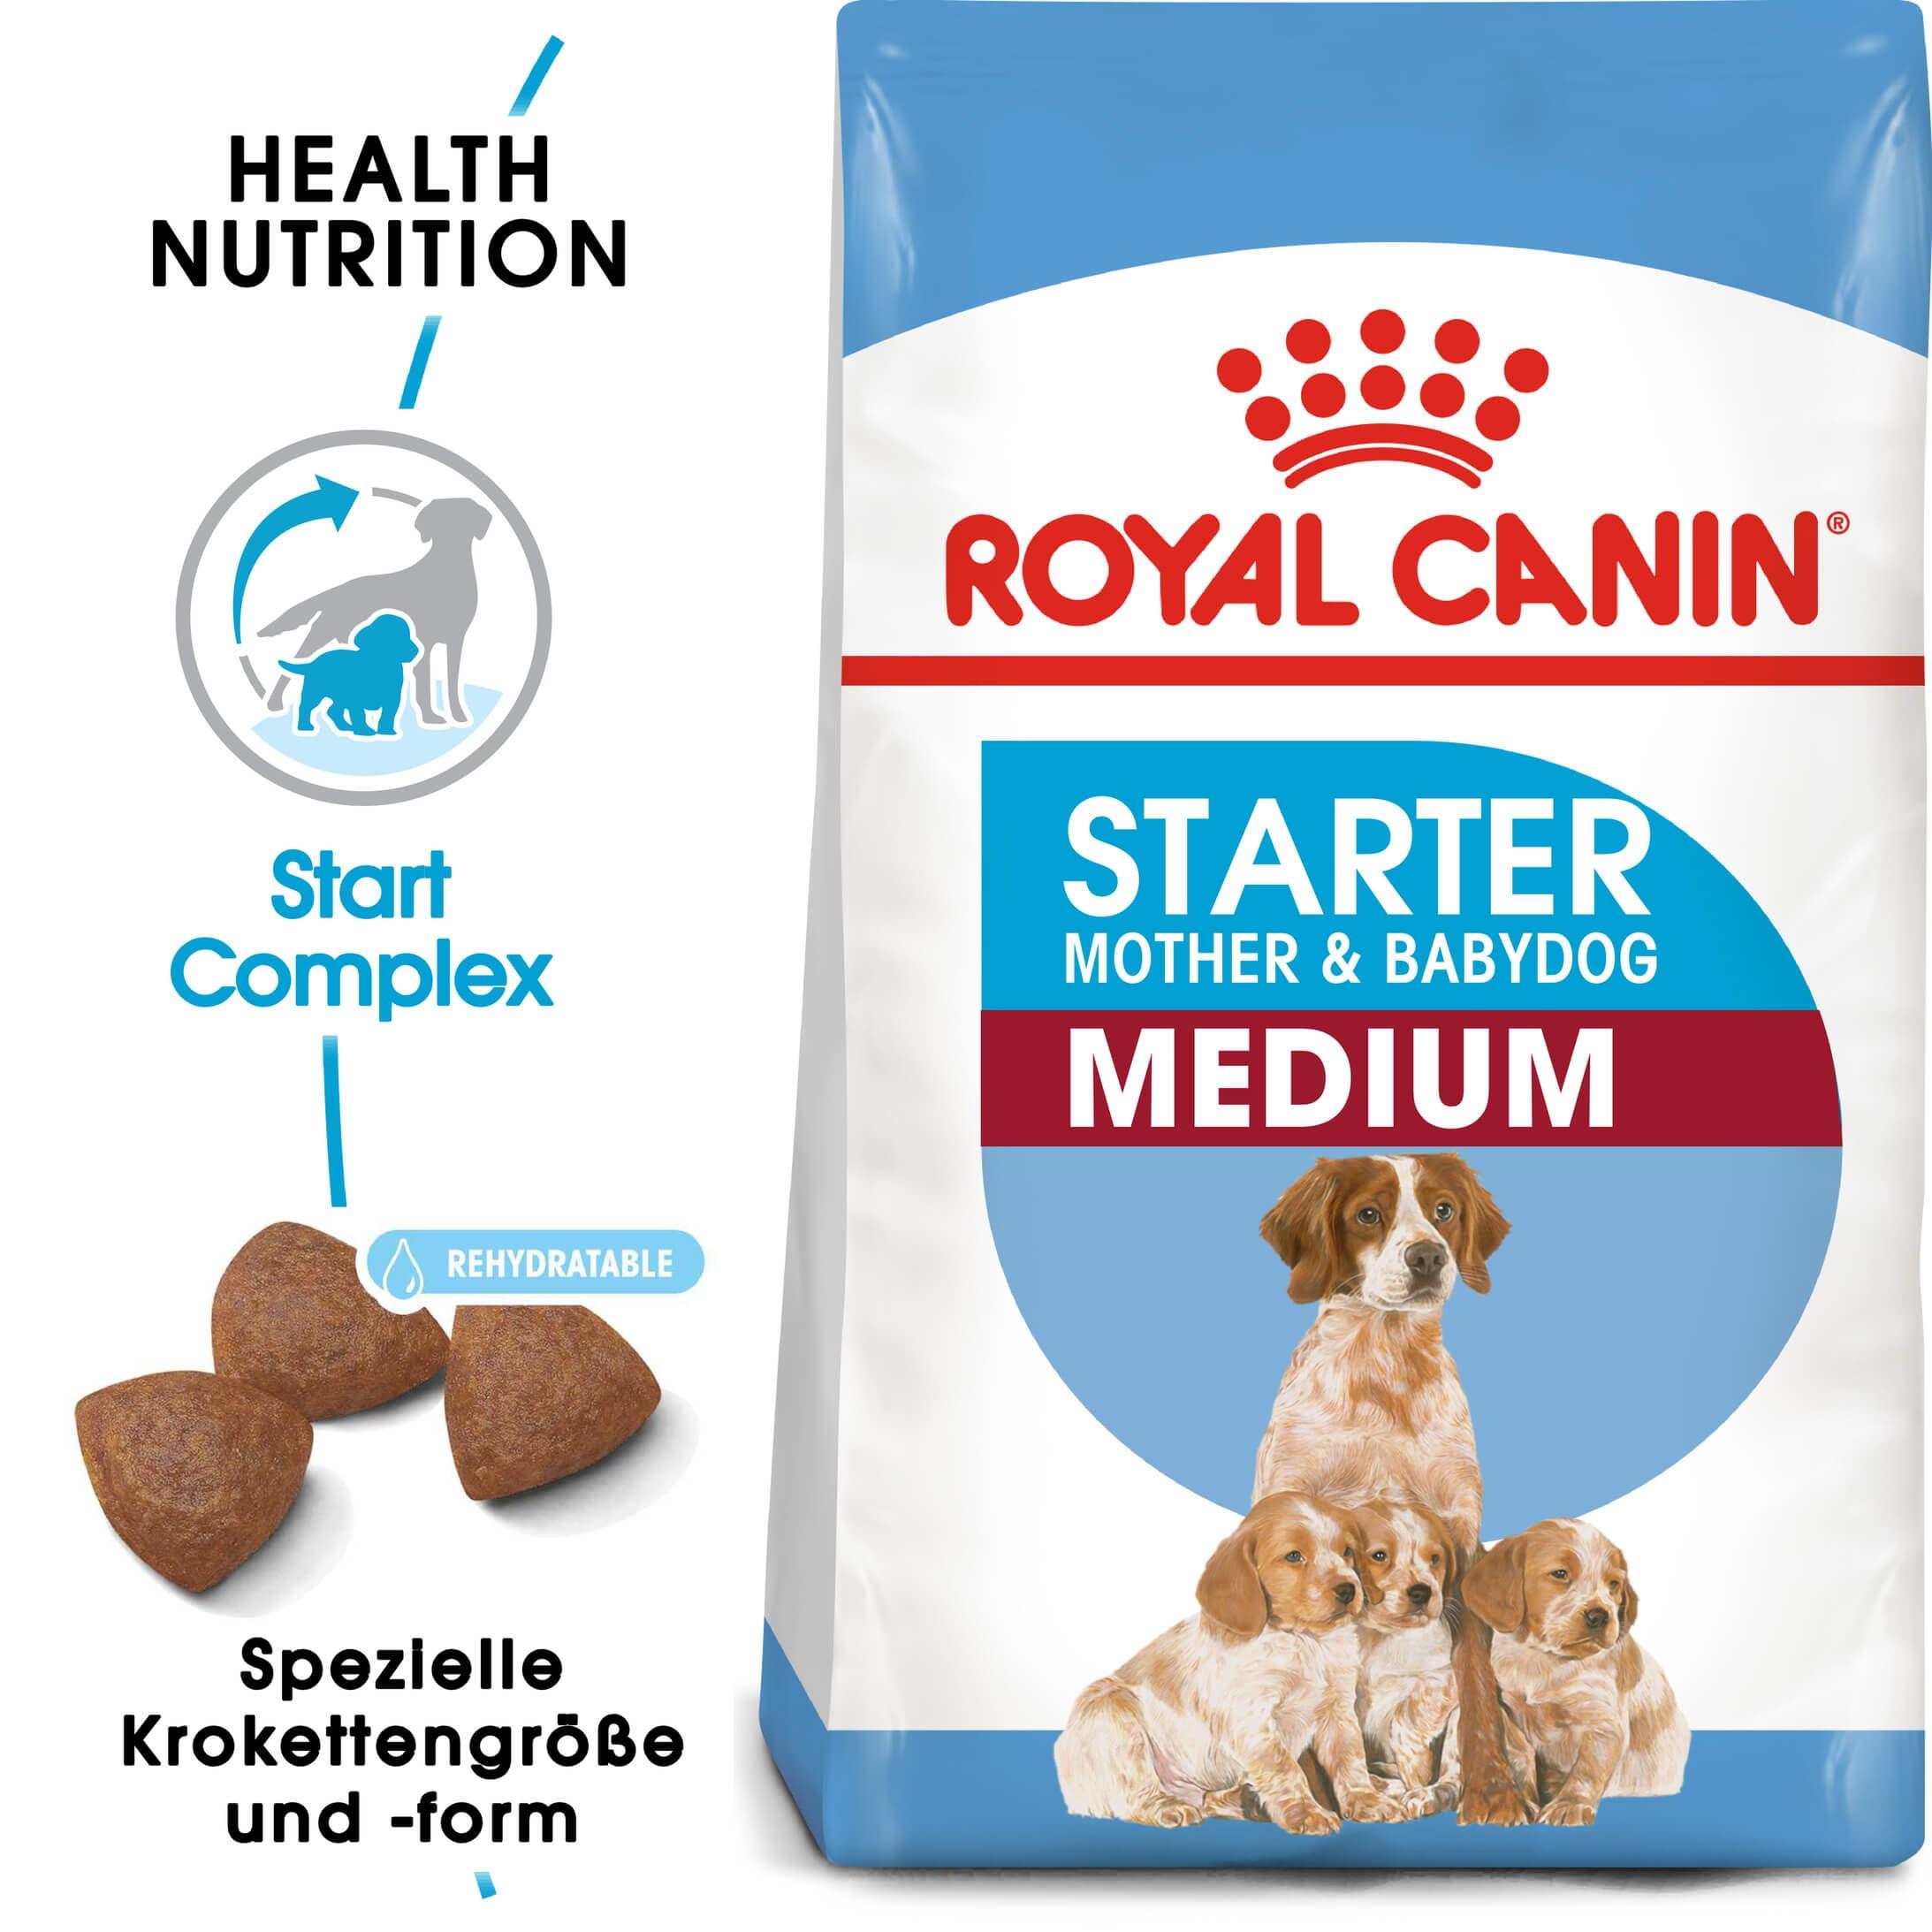 Royal Canin Medium Starter Mother and Babydog